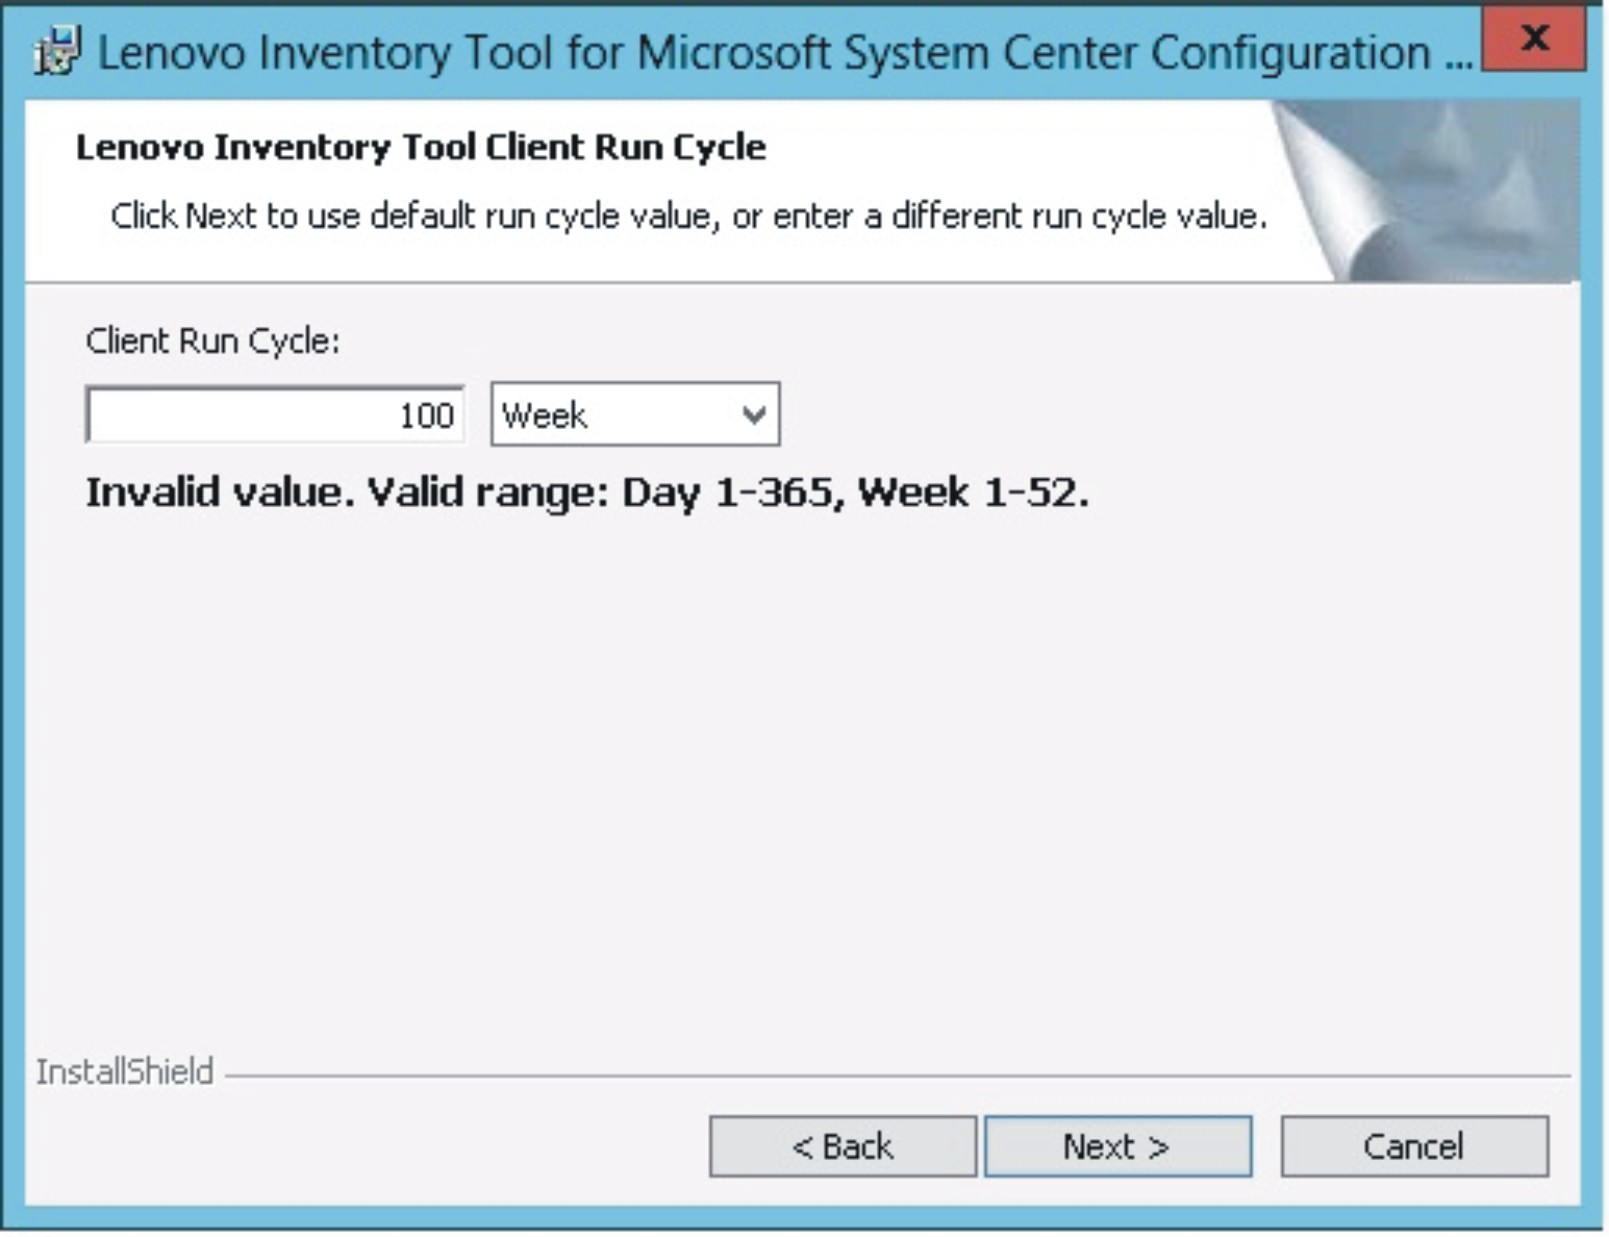 Installing - Lenovo Inventory Tool